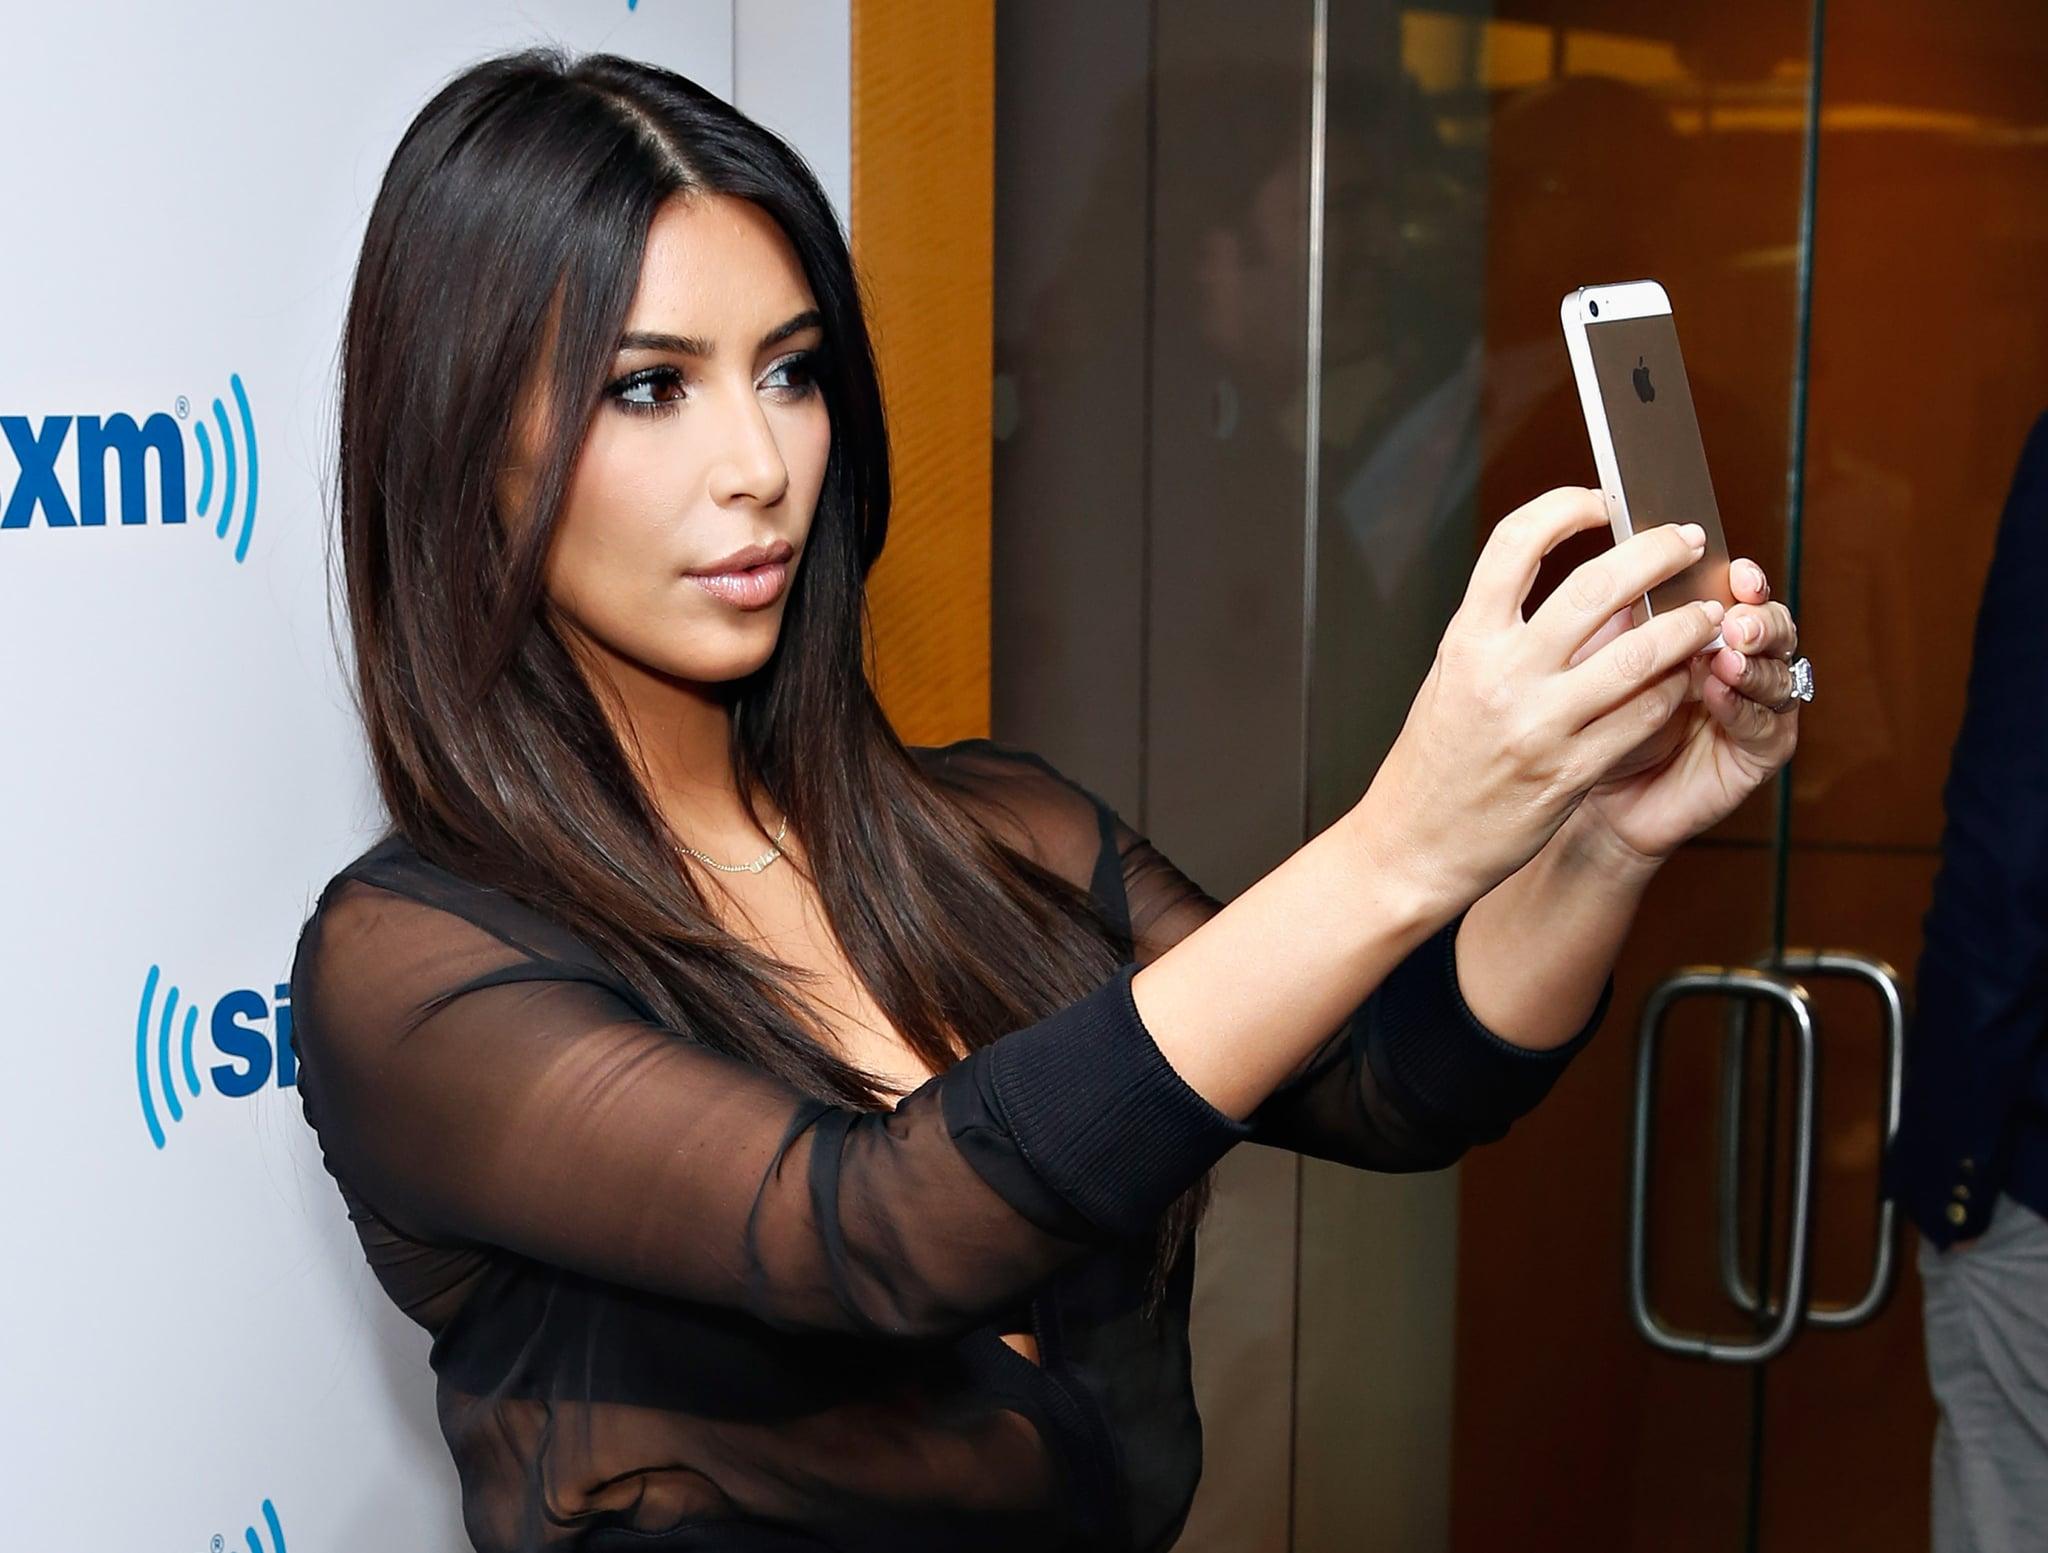 ICloud Kim Kardashian West nude photos 2019